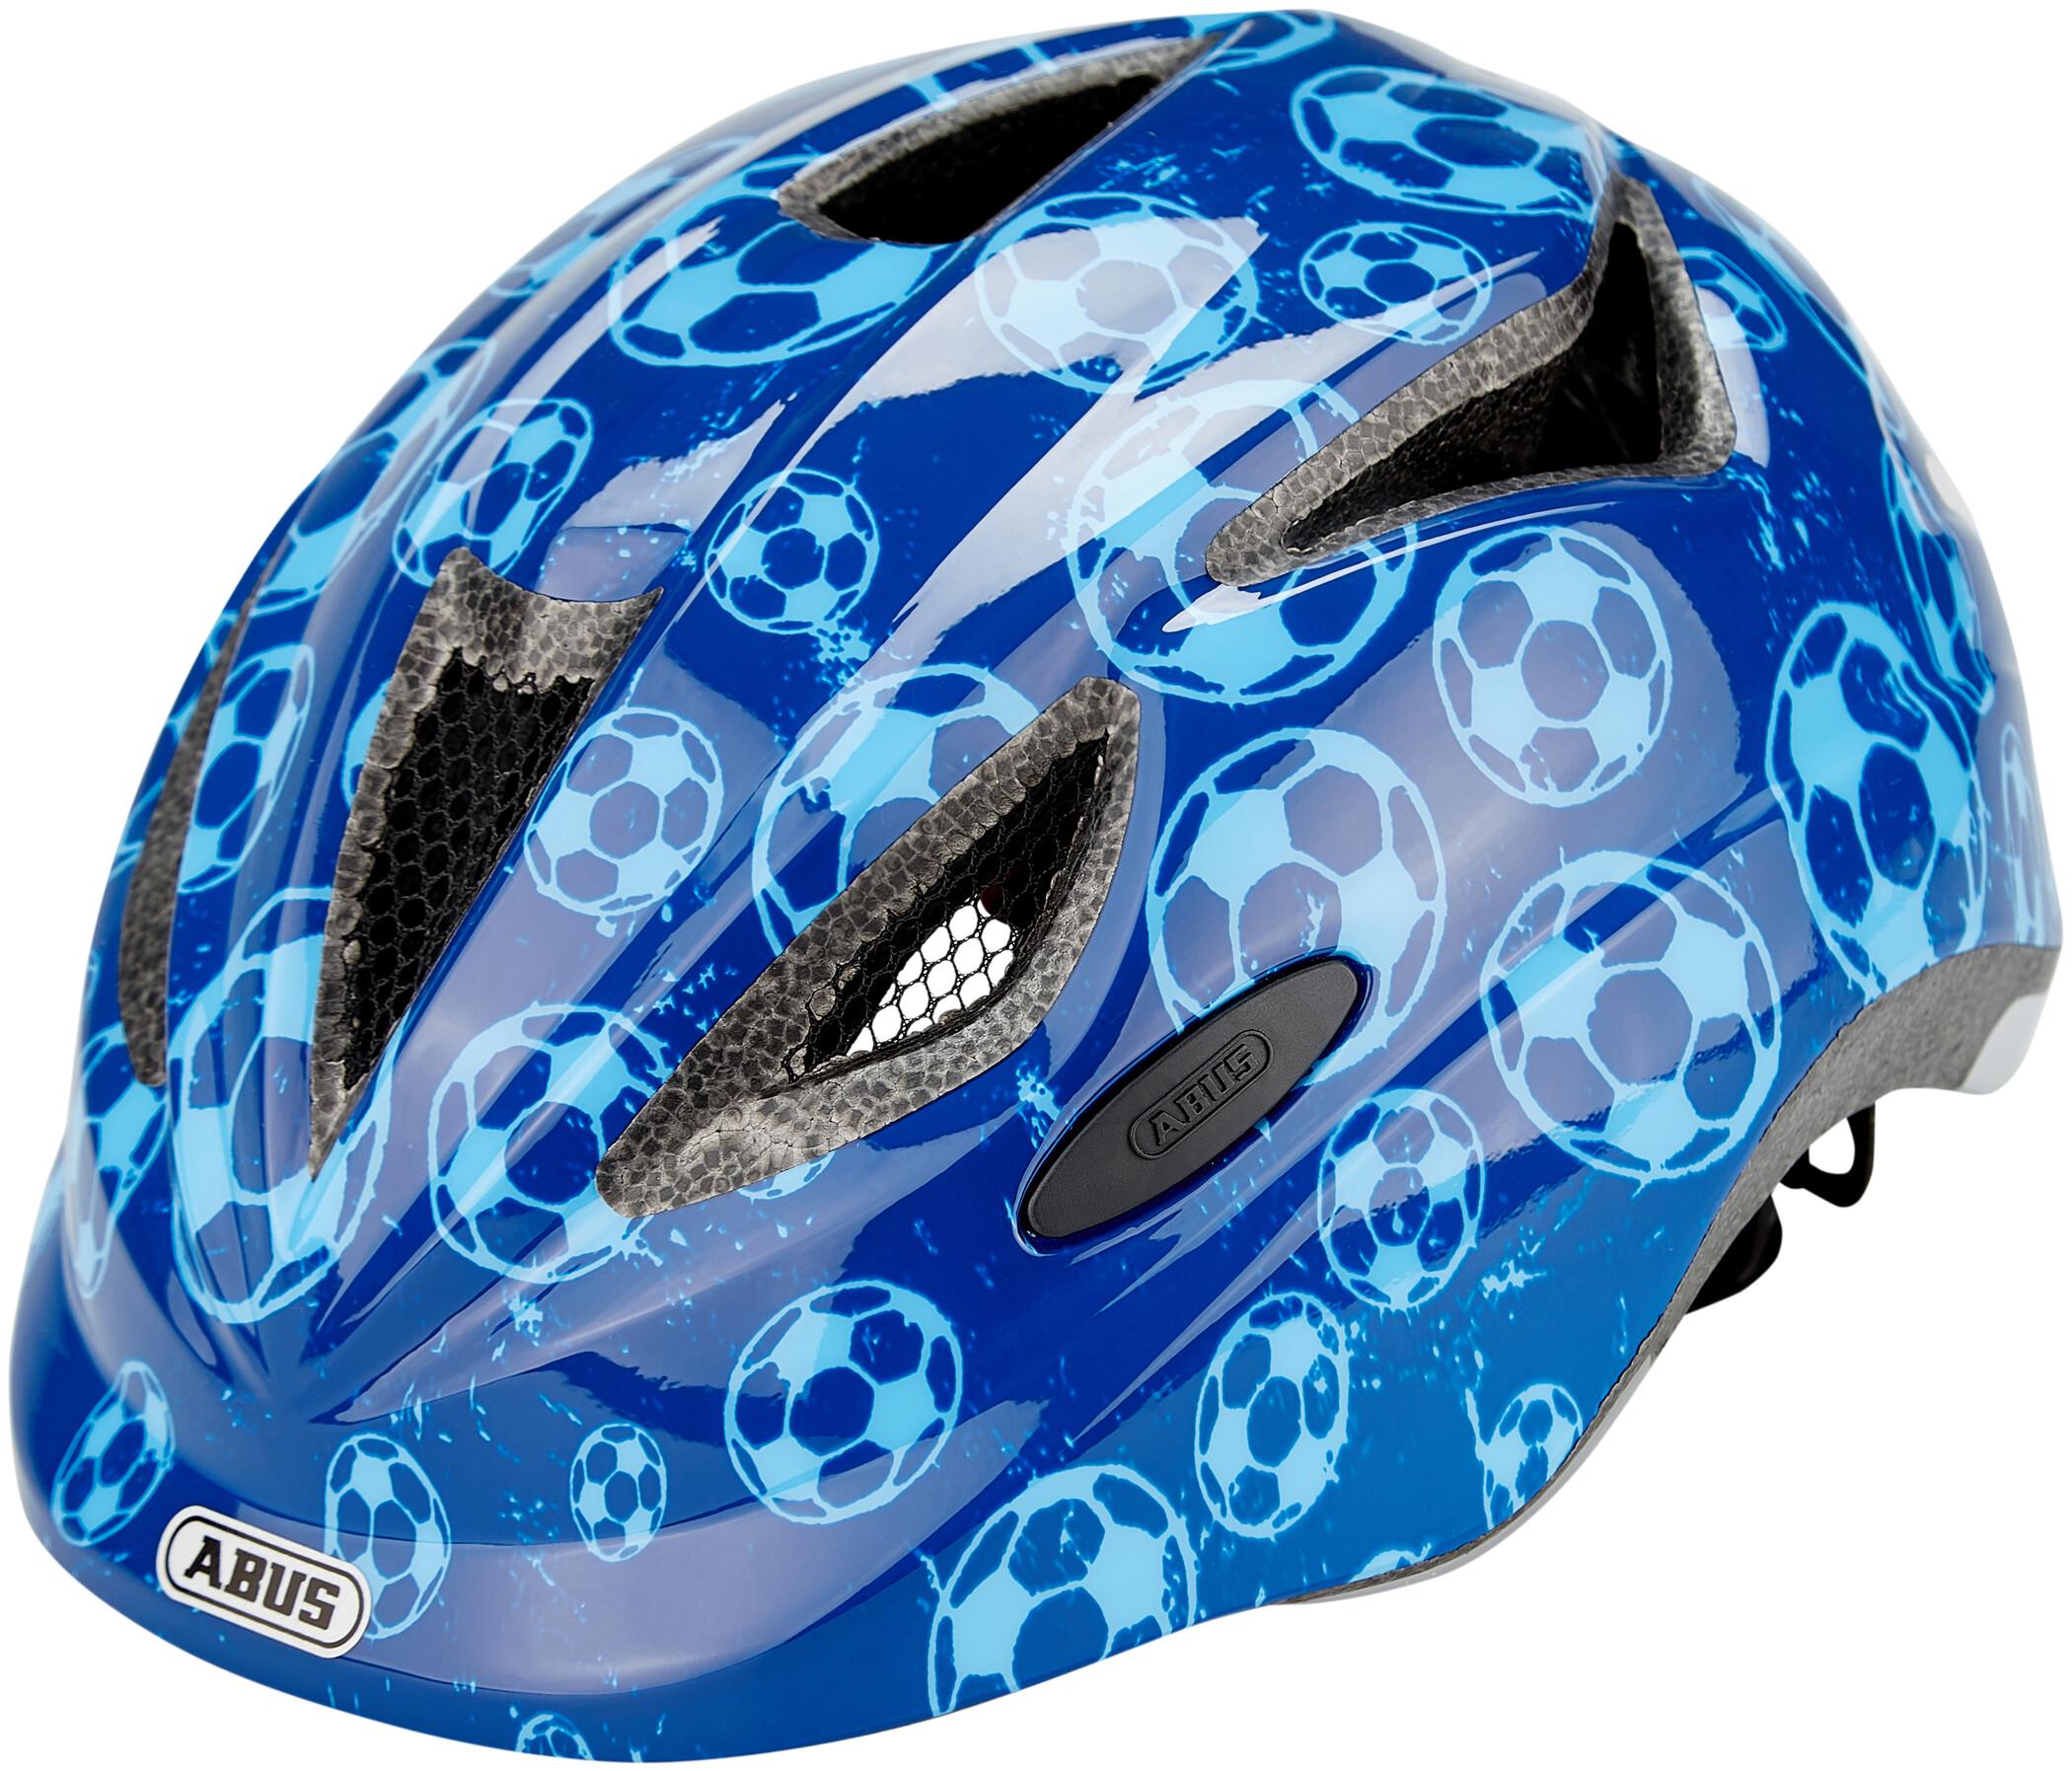 Abus Anuky cykelhjelm - Blue Soccer 52 - 57 cm. | Helmets